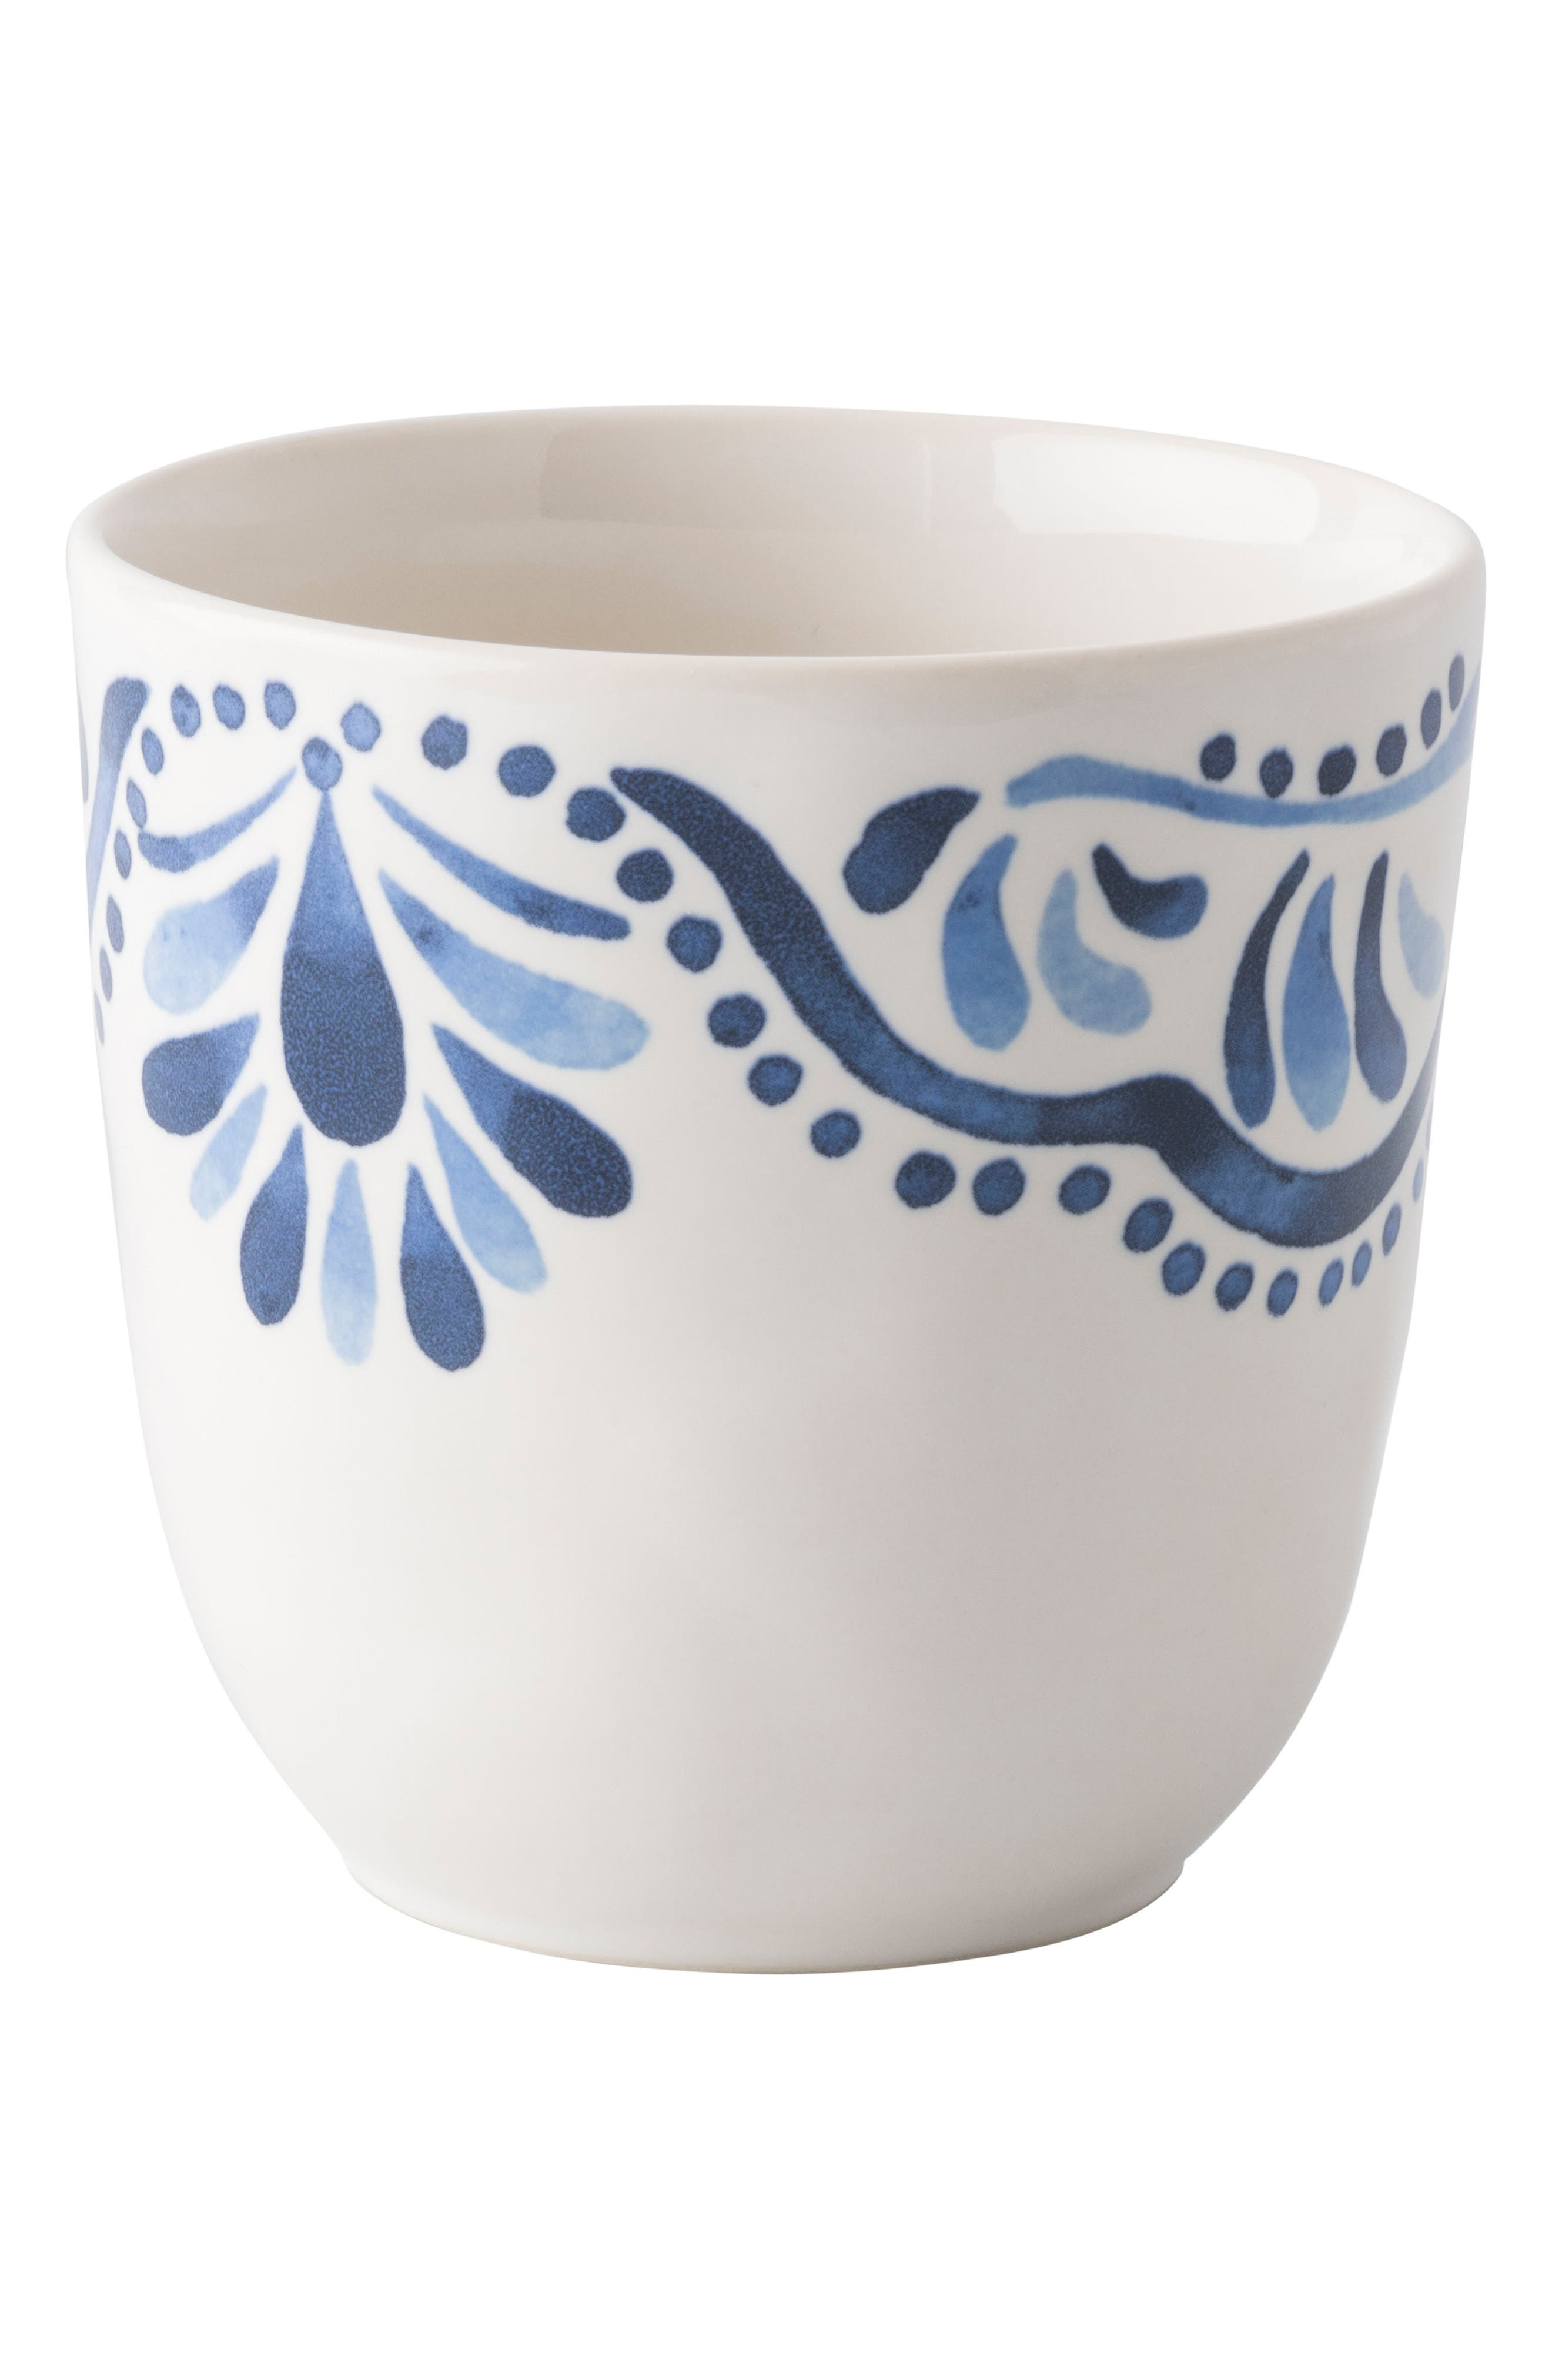 Main Image - Juliska Wanderlust Collection - Iberian Journey Ceramic Coffee/Tea Cup